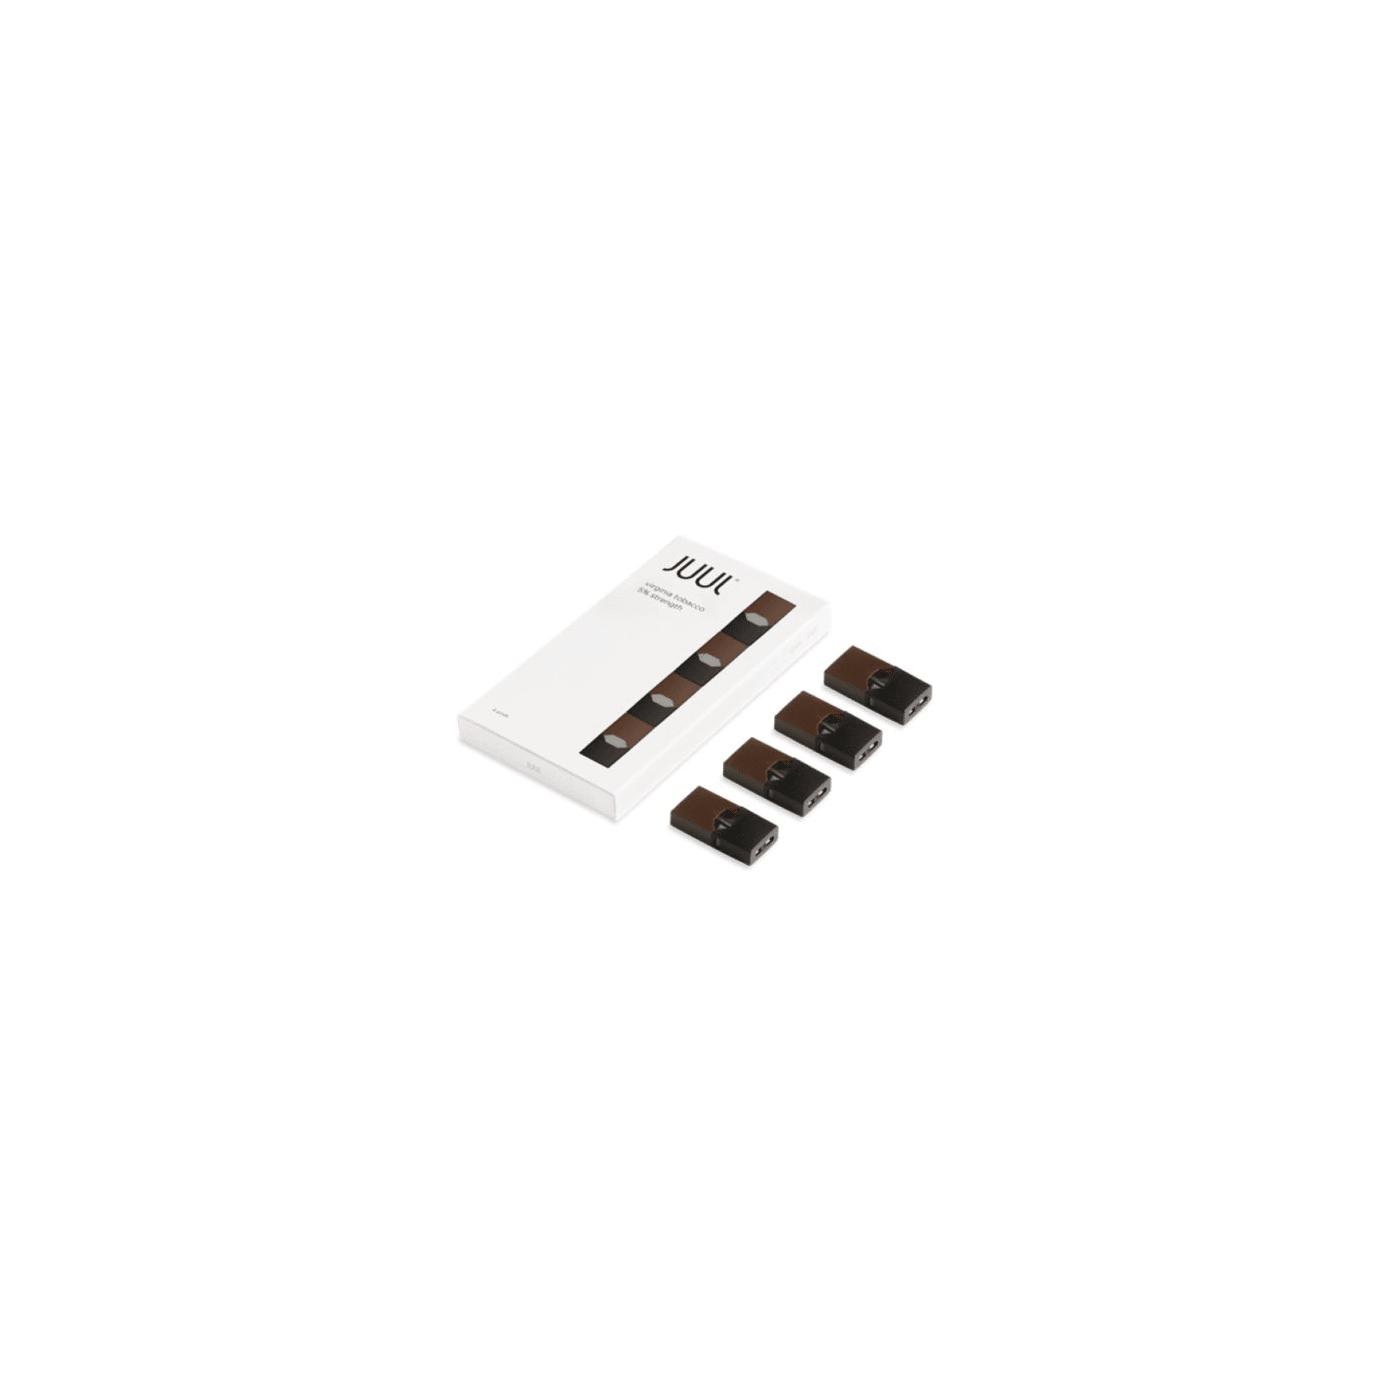 JUUL Pods Virginia Tobacco - 4 Pack - 5%